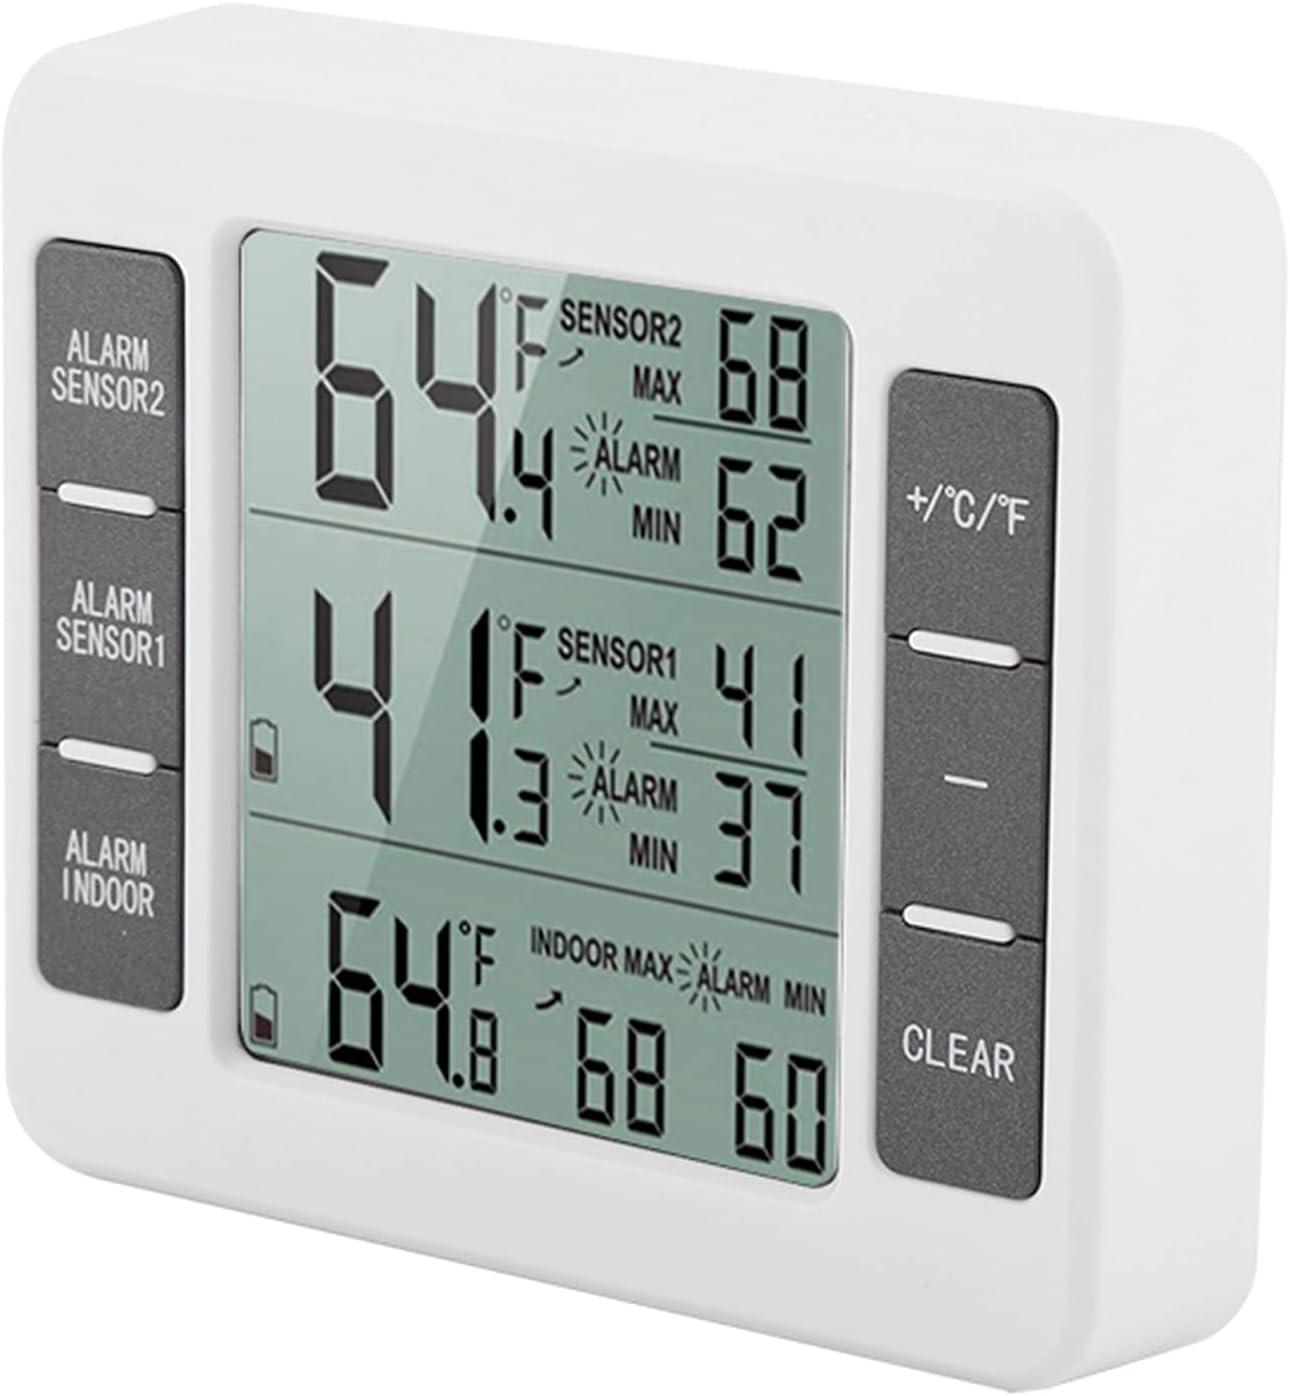 Freezer Room Seasonal Wrap Introduction Refrigerator Import Audible Alarm Hom Digital for Kitchen